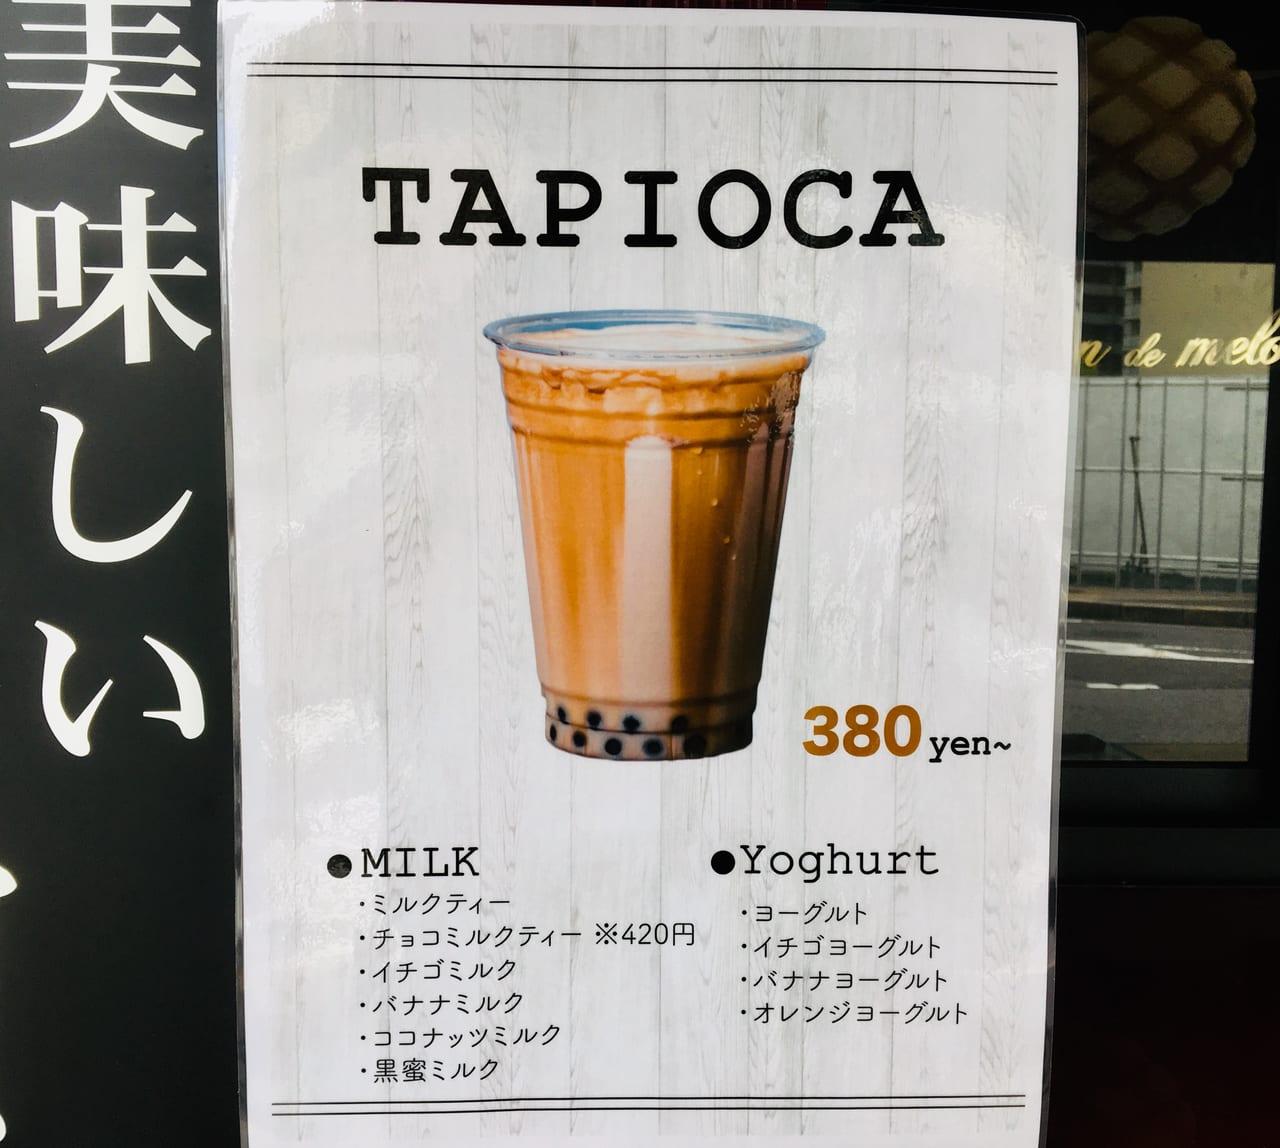 melon tapioca